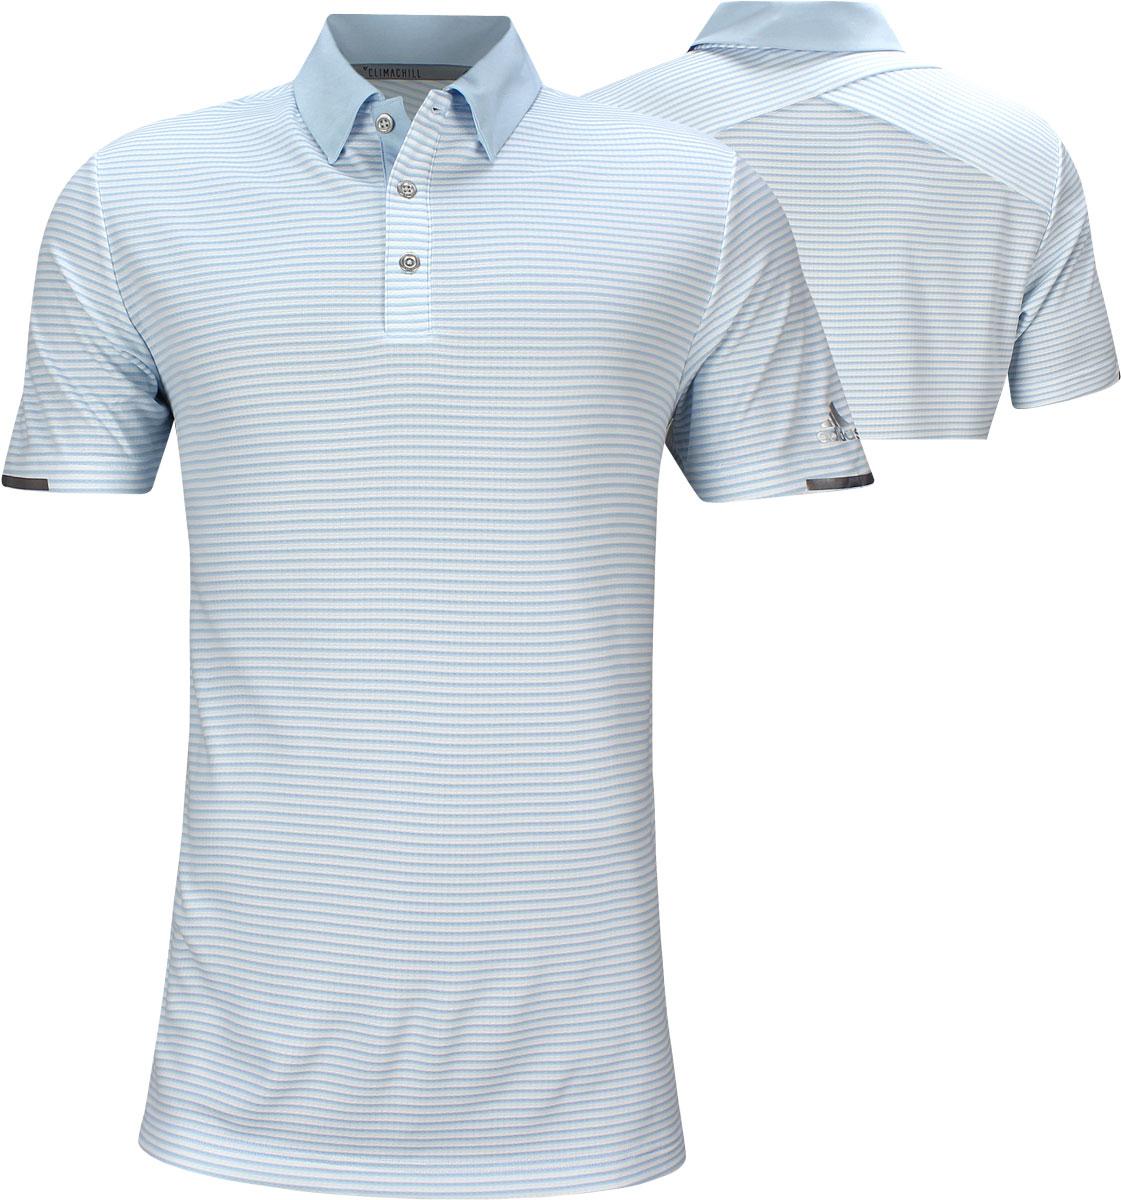 a11346be0 Adidas ClimaChill 2-Color Tonal Stripe Golf Shirts - Glow Blue - Jon Rahm  British Open. undefined. undefined. Enlarge